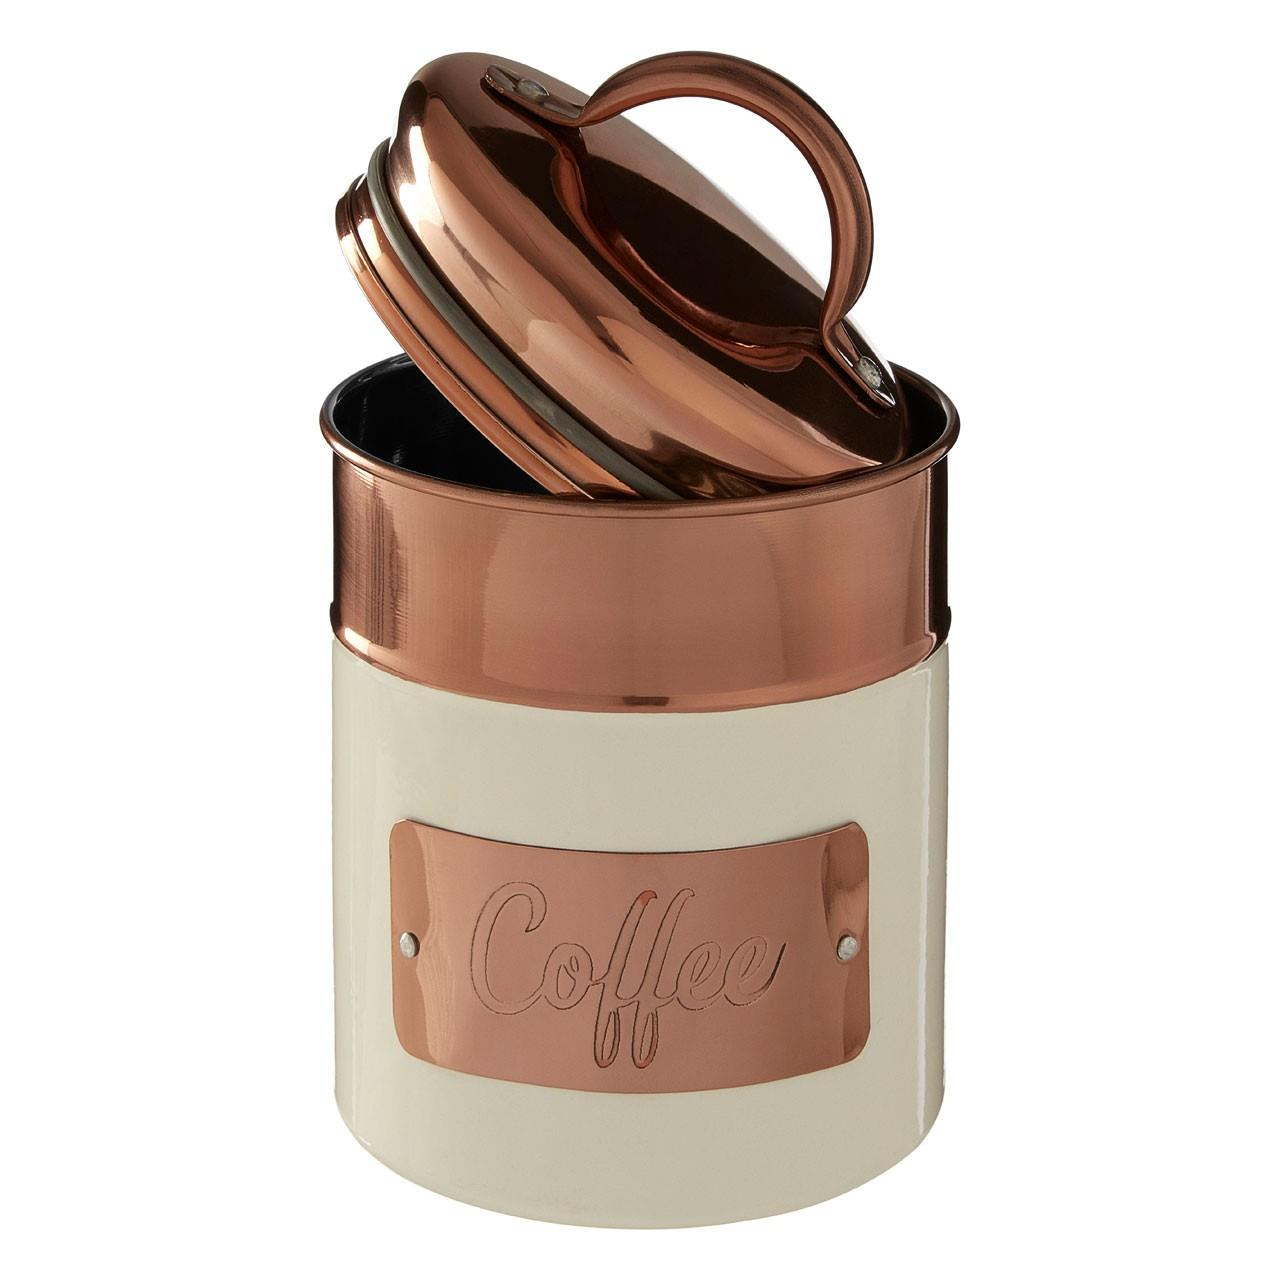 Prescott-Cream-Copper-Bread-Bin-Biscuit-Sugar-Coffee-Canister-Utensil-Holder thumbnail 16